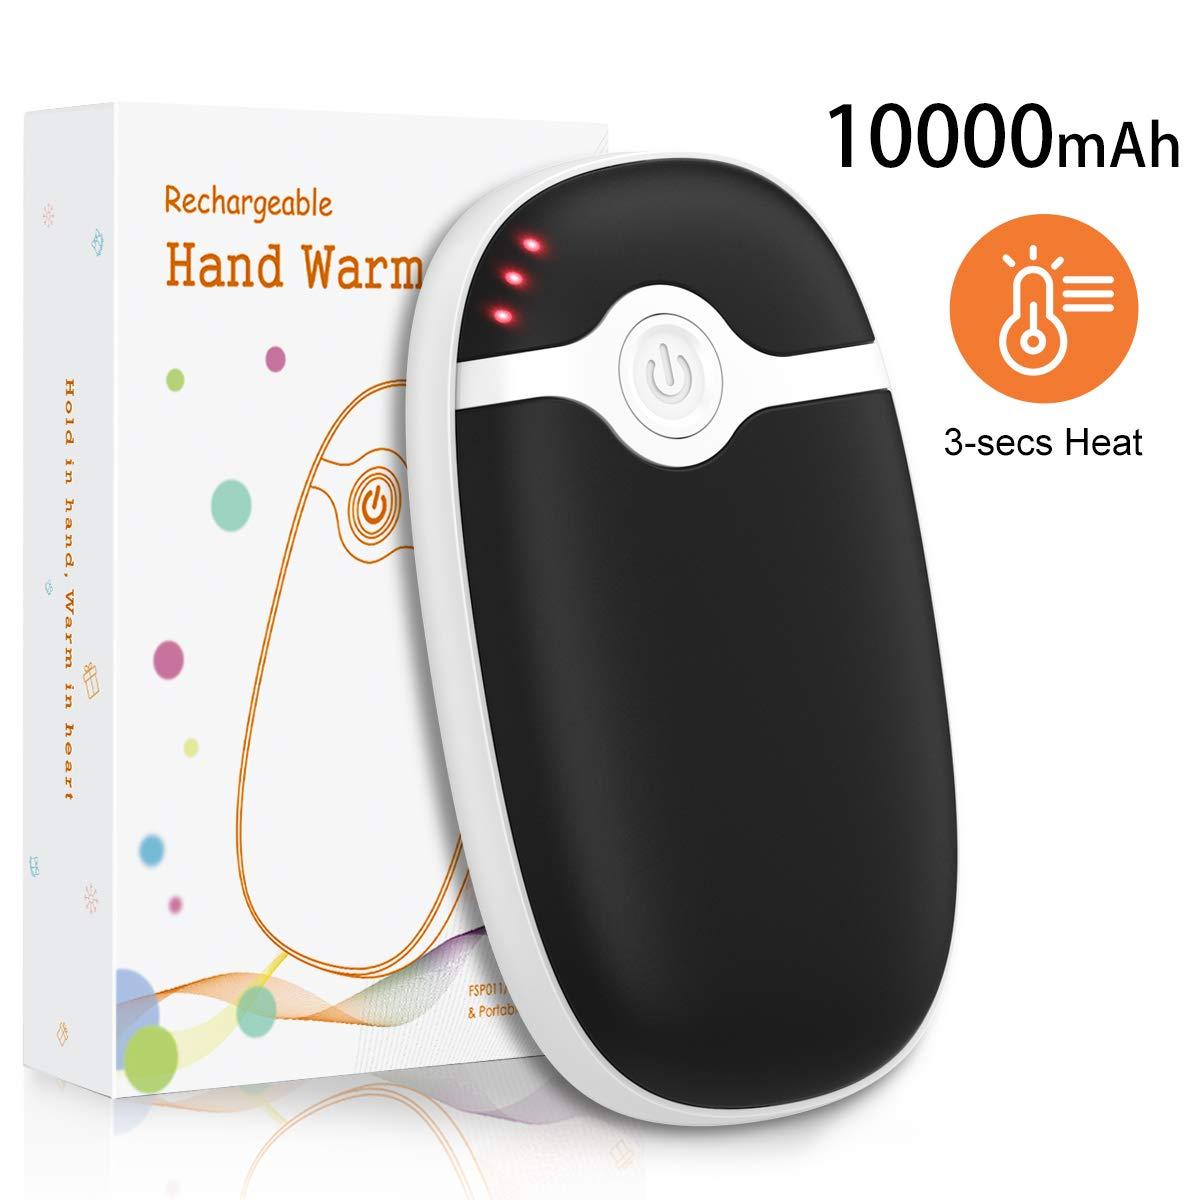 Practical Handwarmer Stainless Steel Pocket Heater Hand Warmer Winter Sports